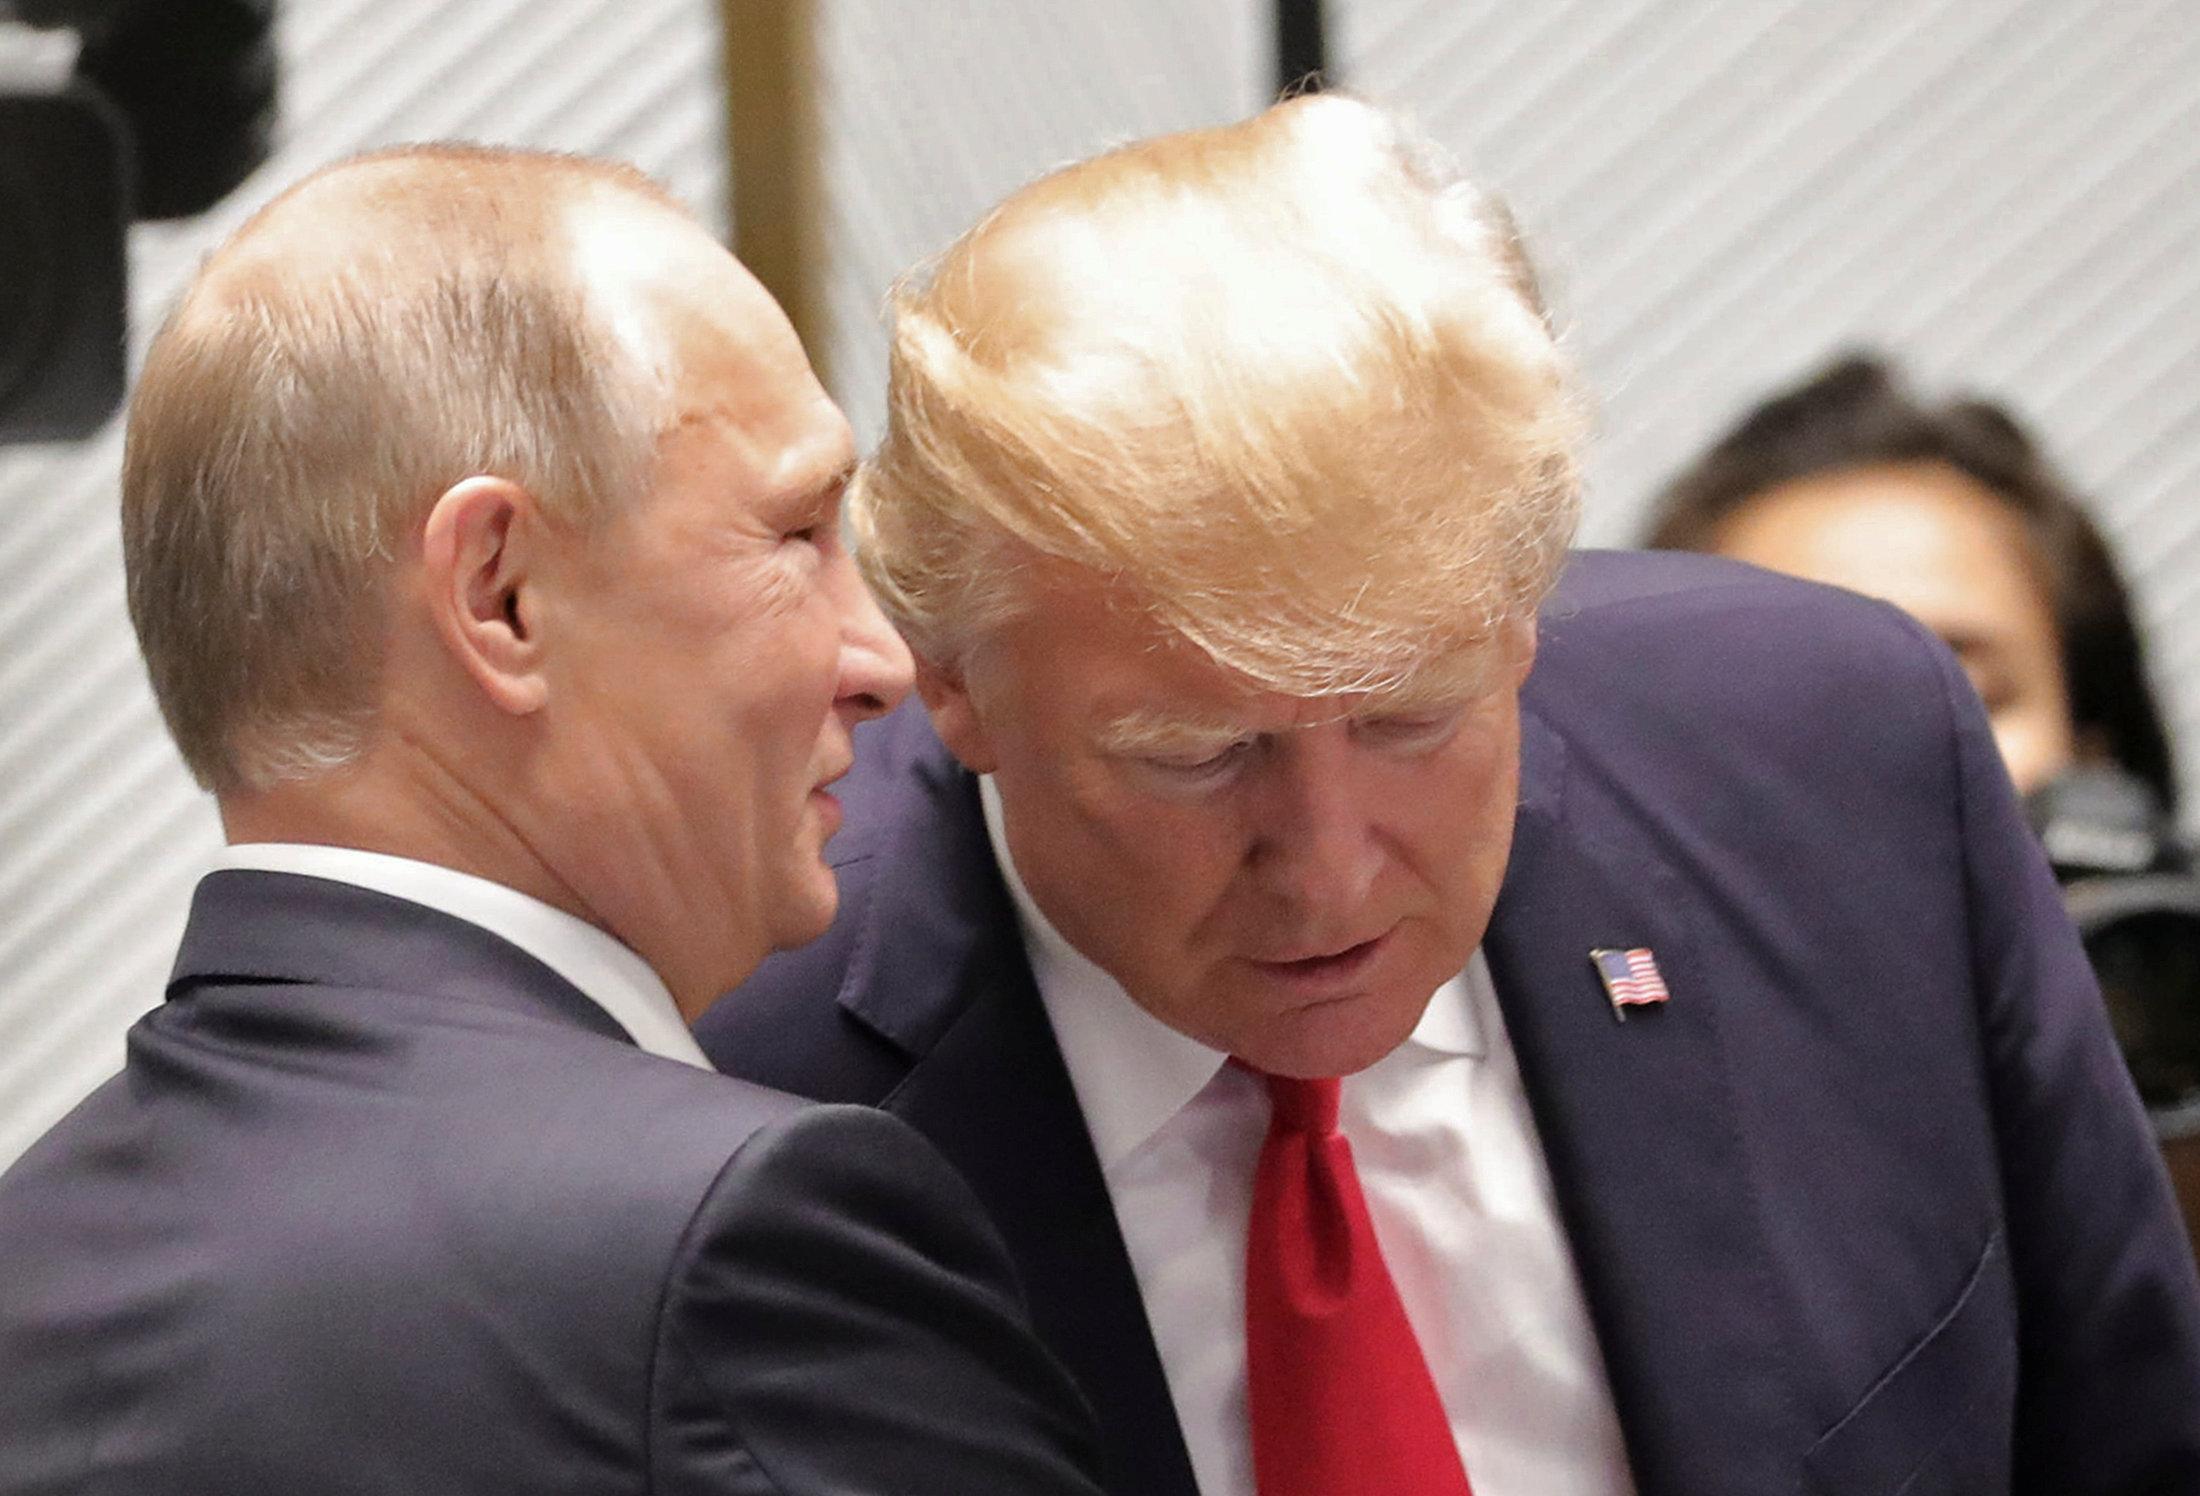 Trump distances himself from remarks on Putin over election meddling